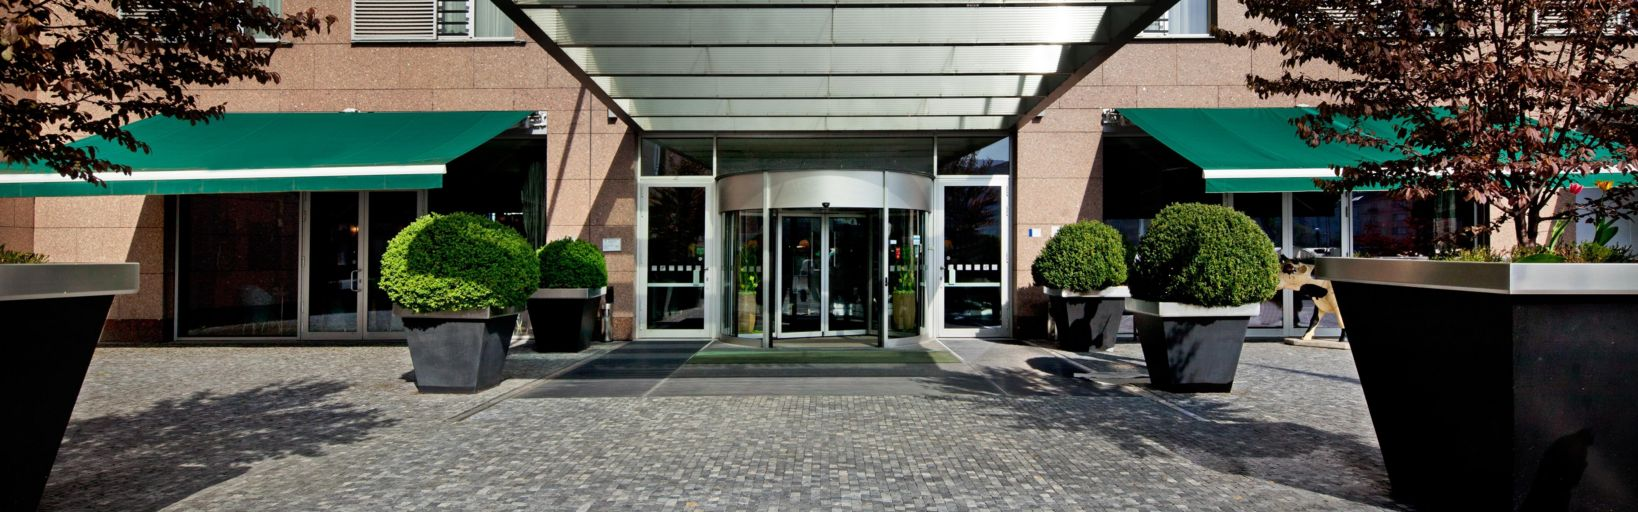 holiday inn prague congress centre hotel by ihg